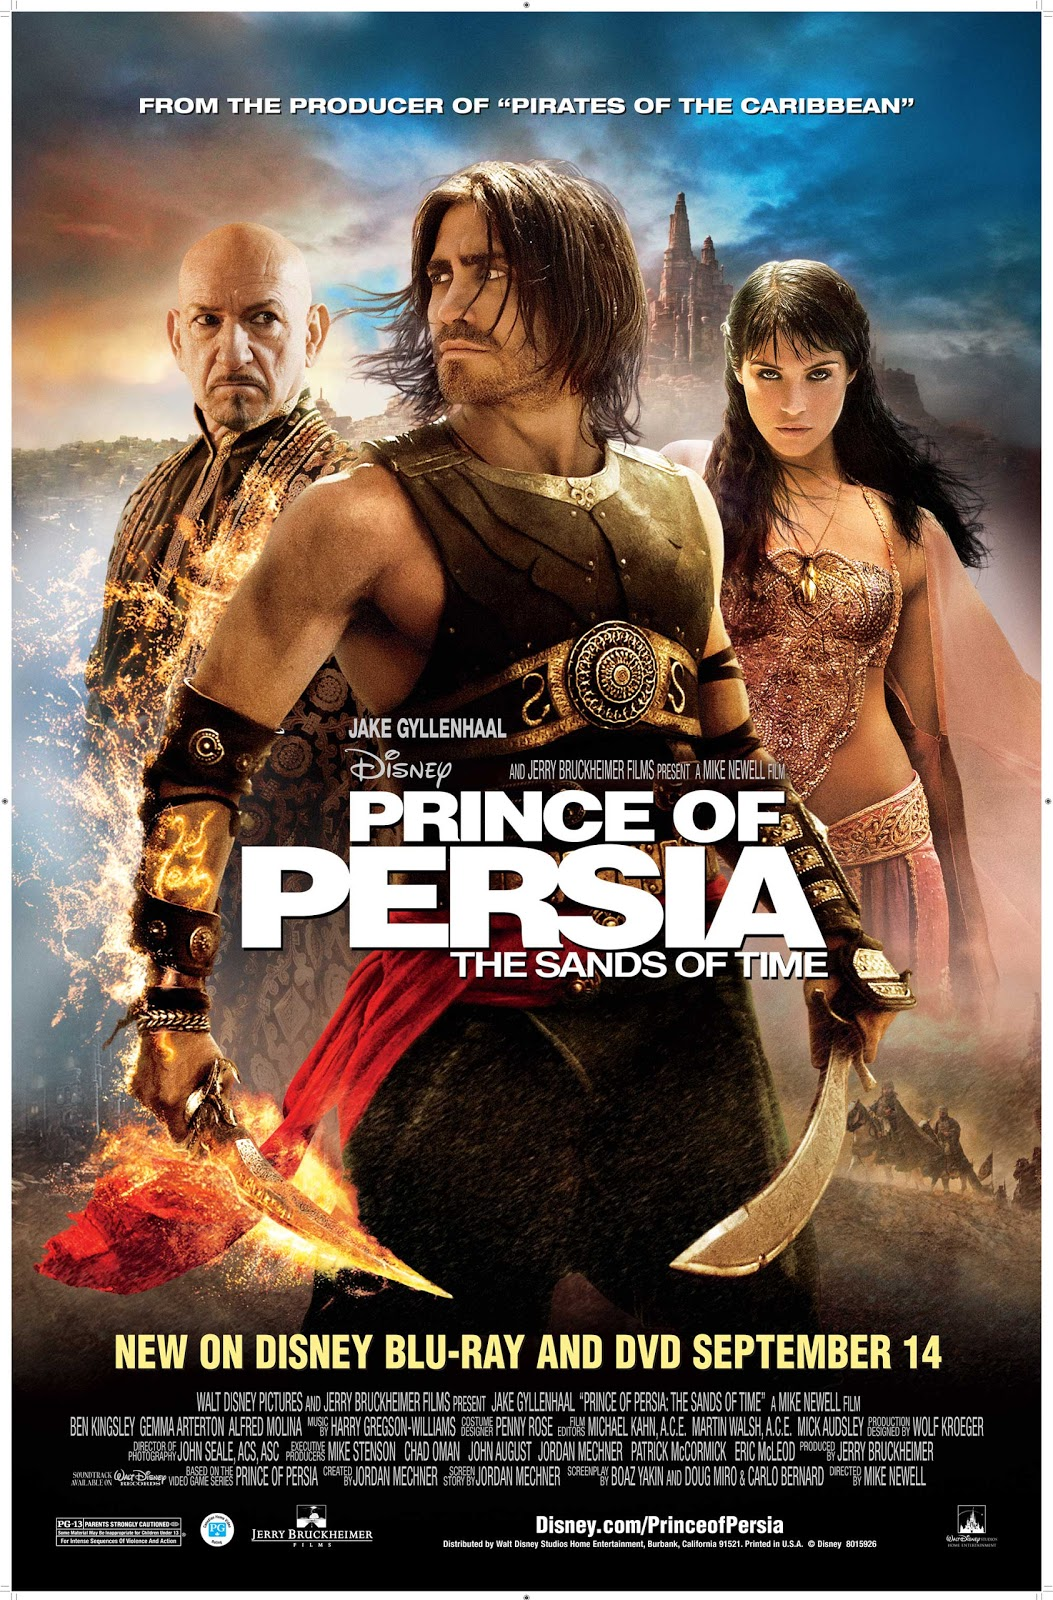 http://2.bp.blogspot.com/_cV6K5HoBX7Y/TRJaz8ACOyI/AAAAAAAAARk/os1FTUTVqnE/s1600/Prince-Of-Persia_Poster.jpg